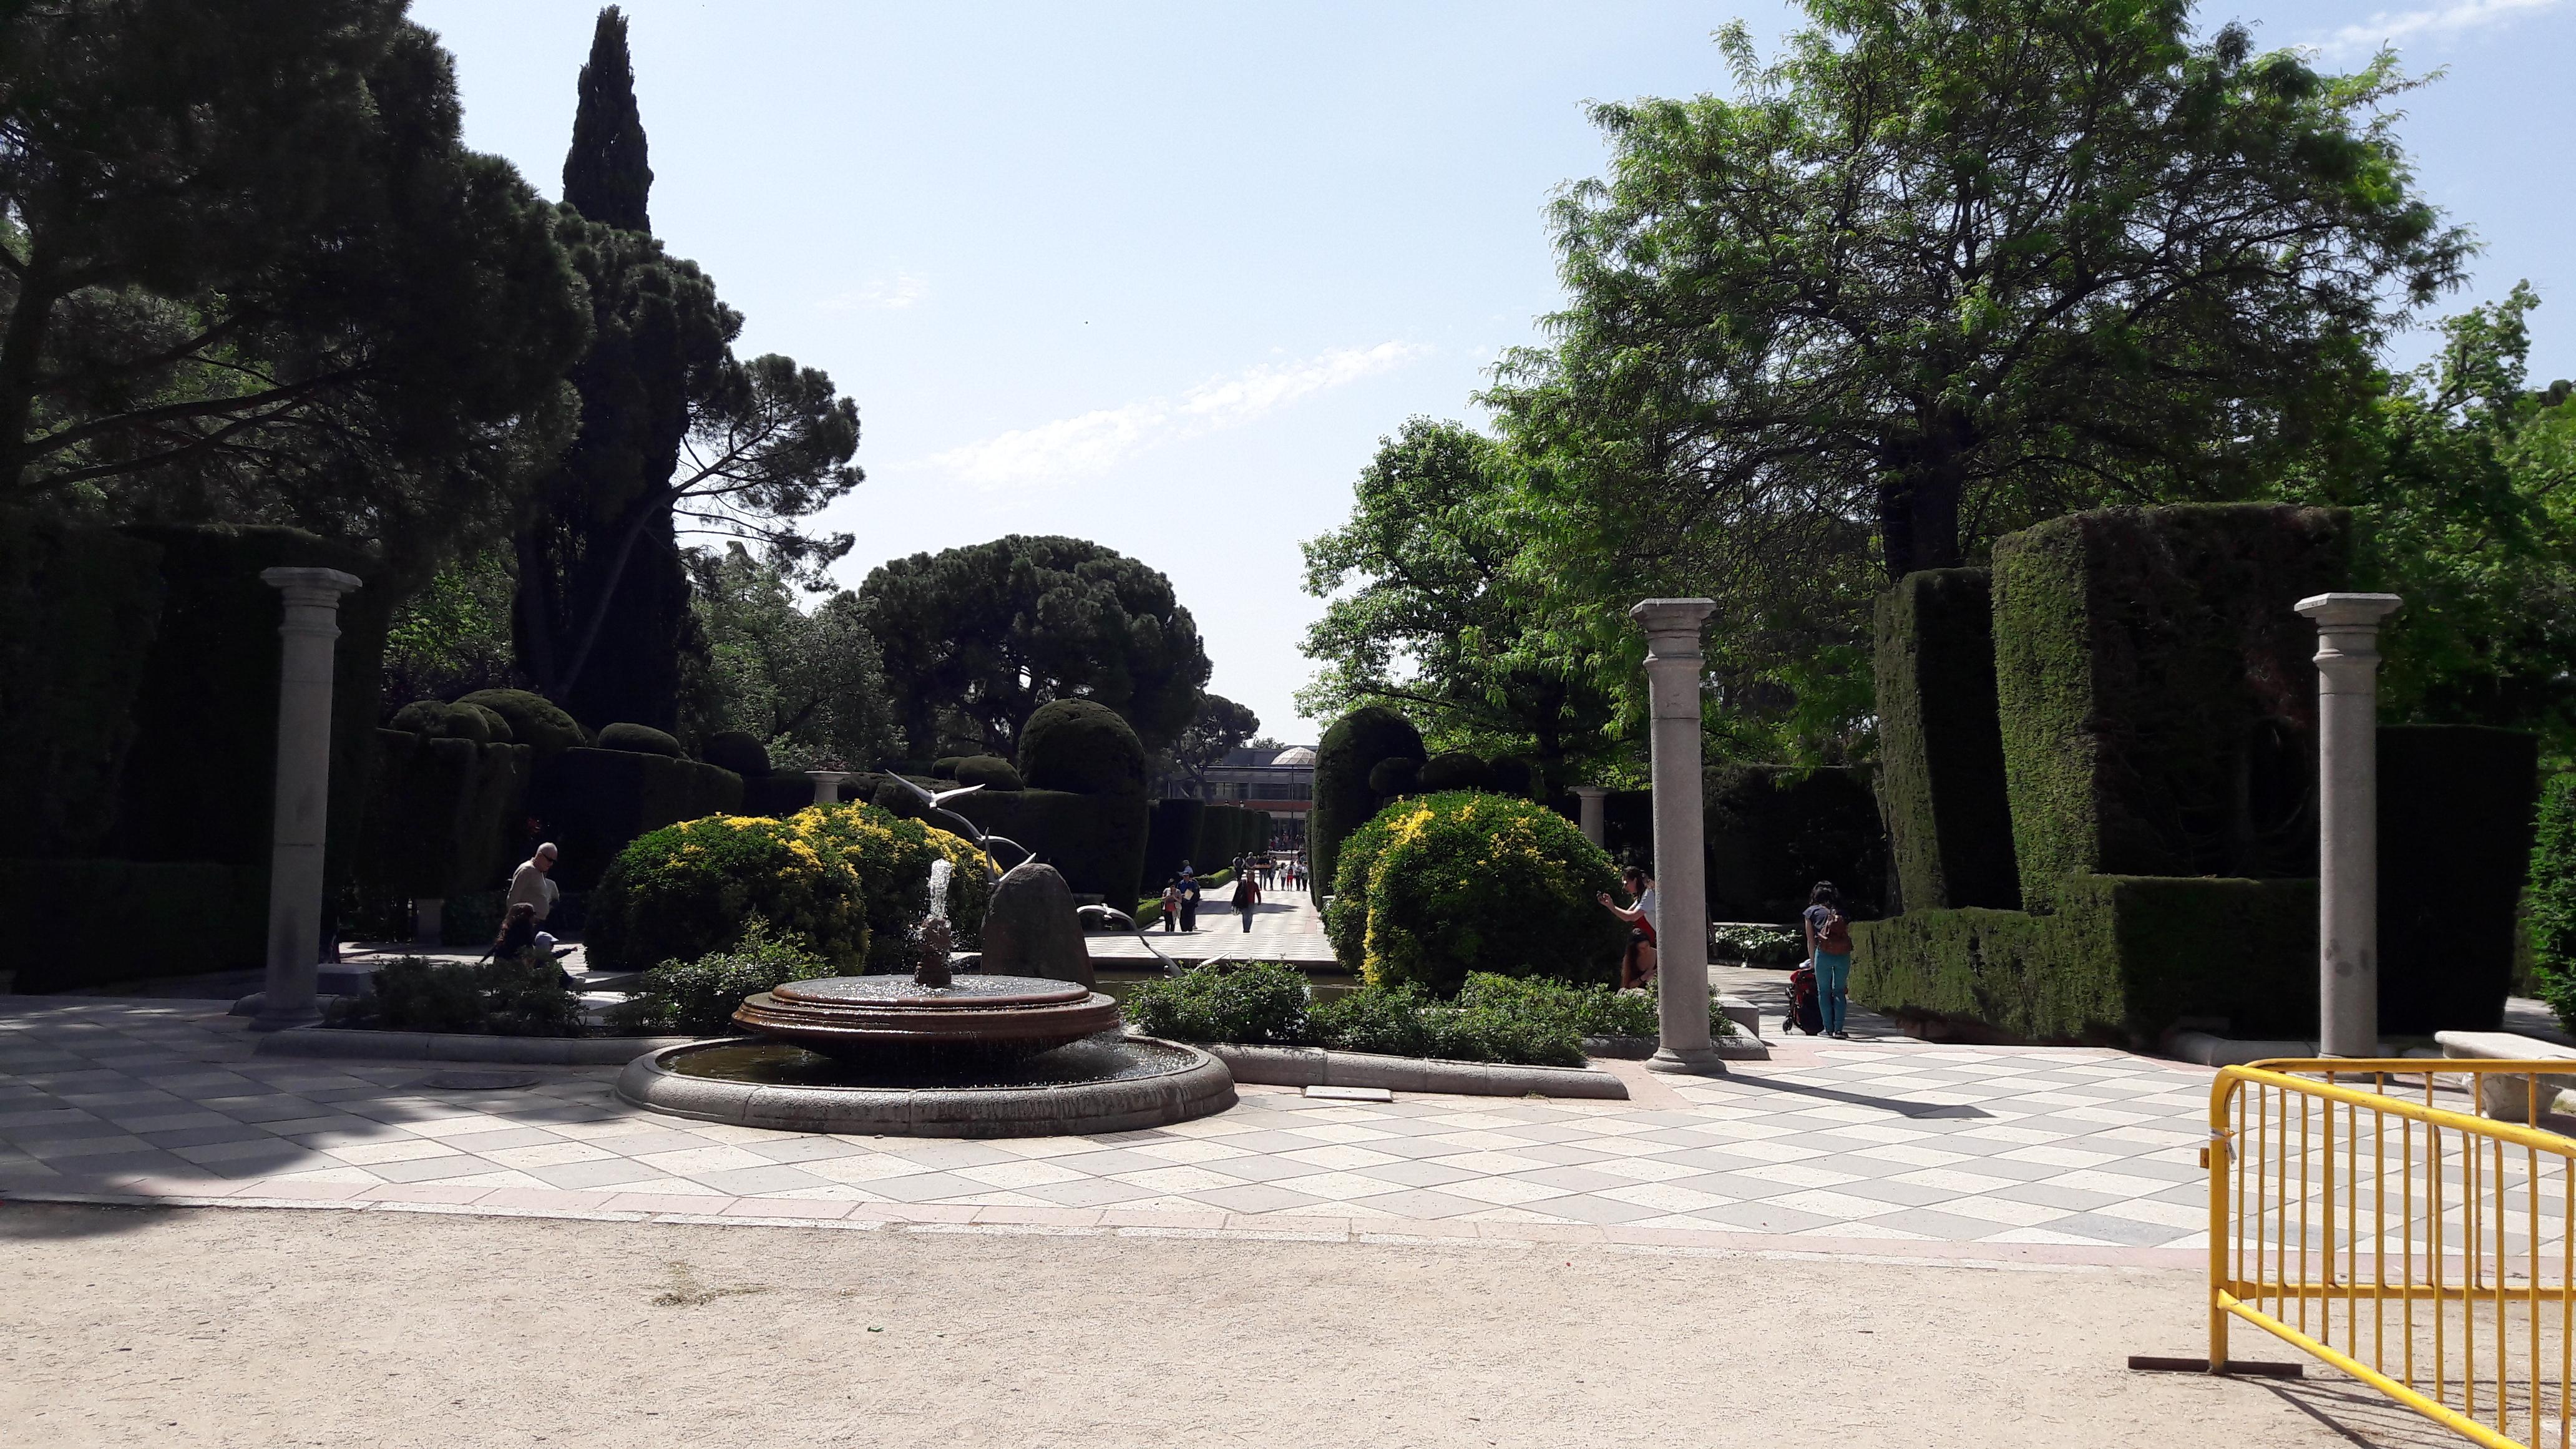 mad-retiro-park-jardines-cecilio-rodriguez-inside-apr17